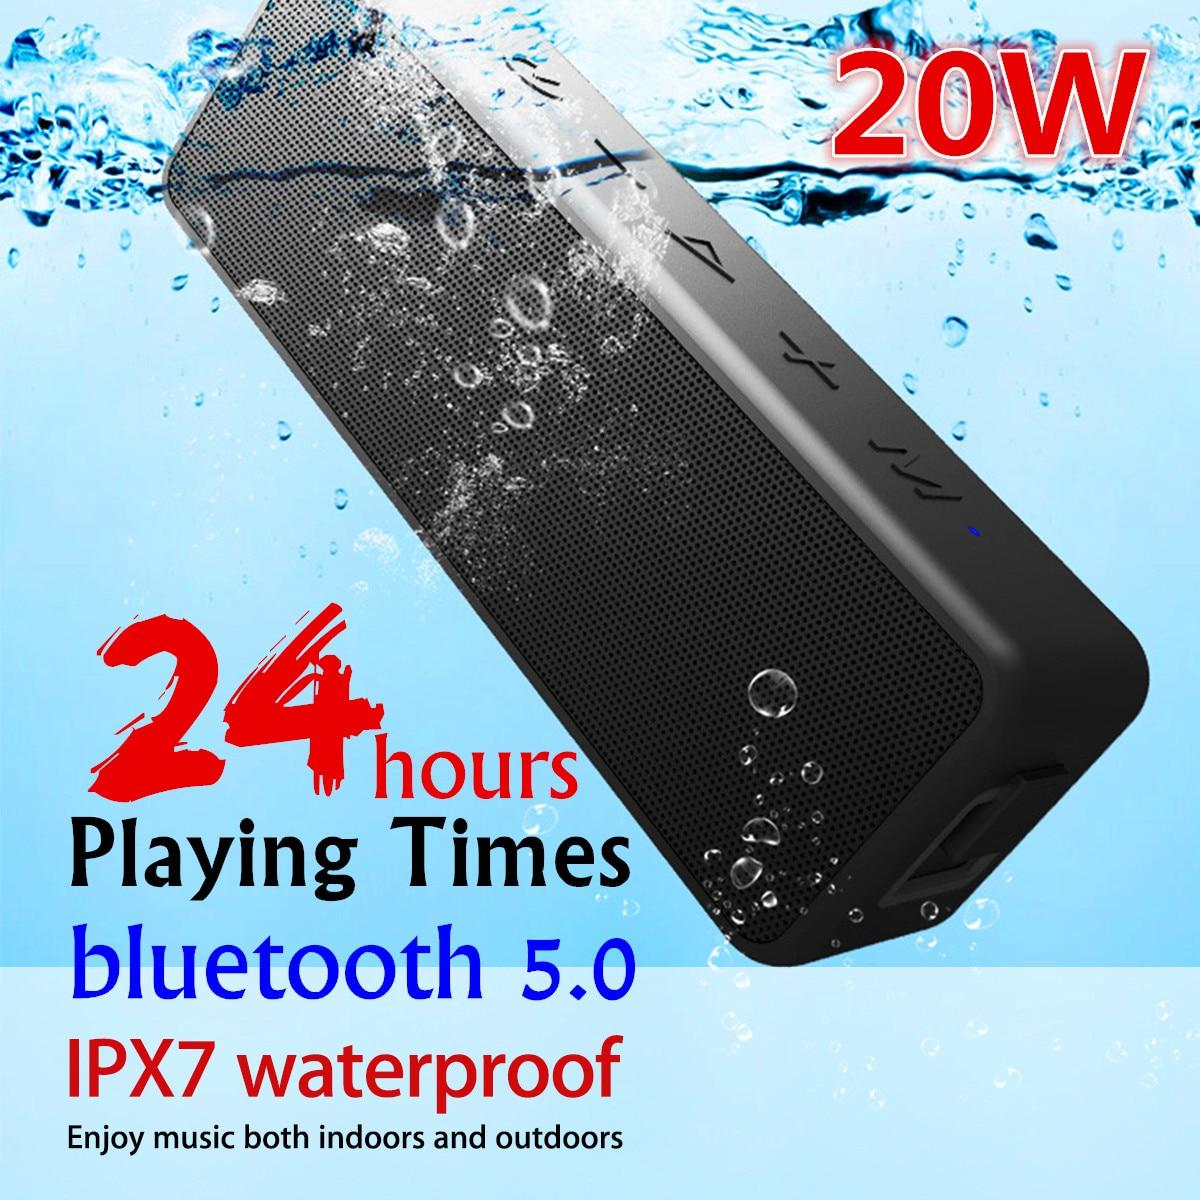 20W Portable bluetooth5.0 Wireless Speaker Better Bass 24 Hour bluetooth Range IPX7 Water Resistance Soundbar Subwoofer